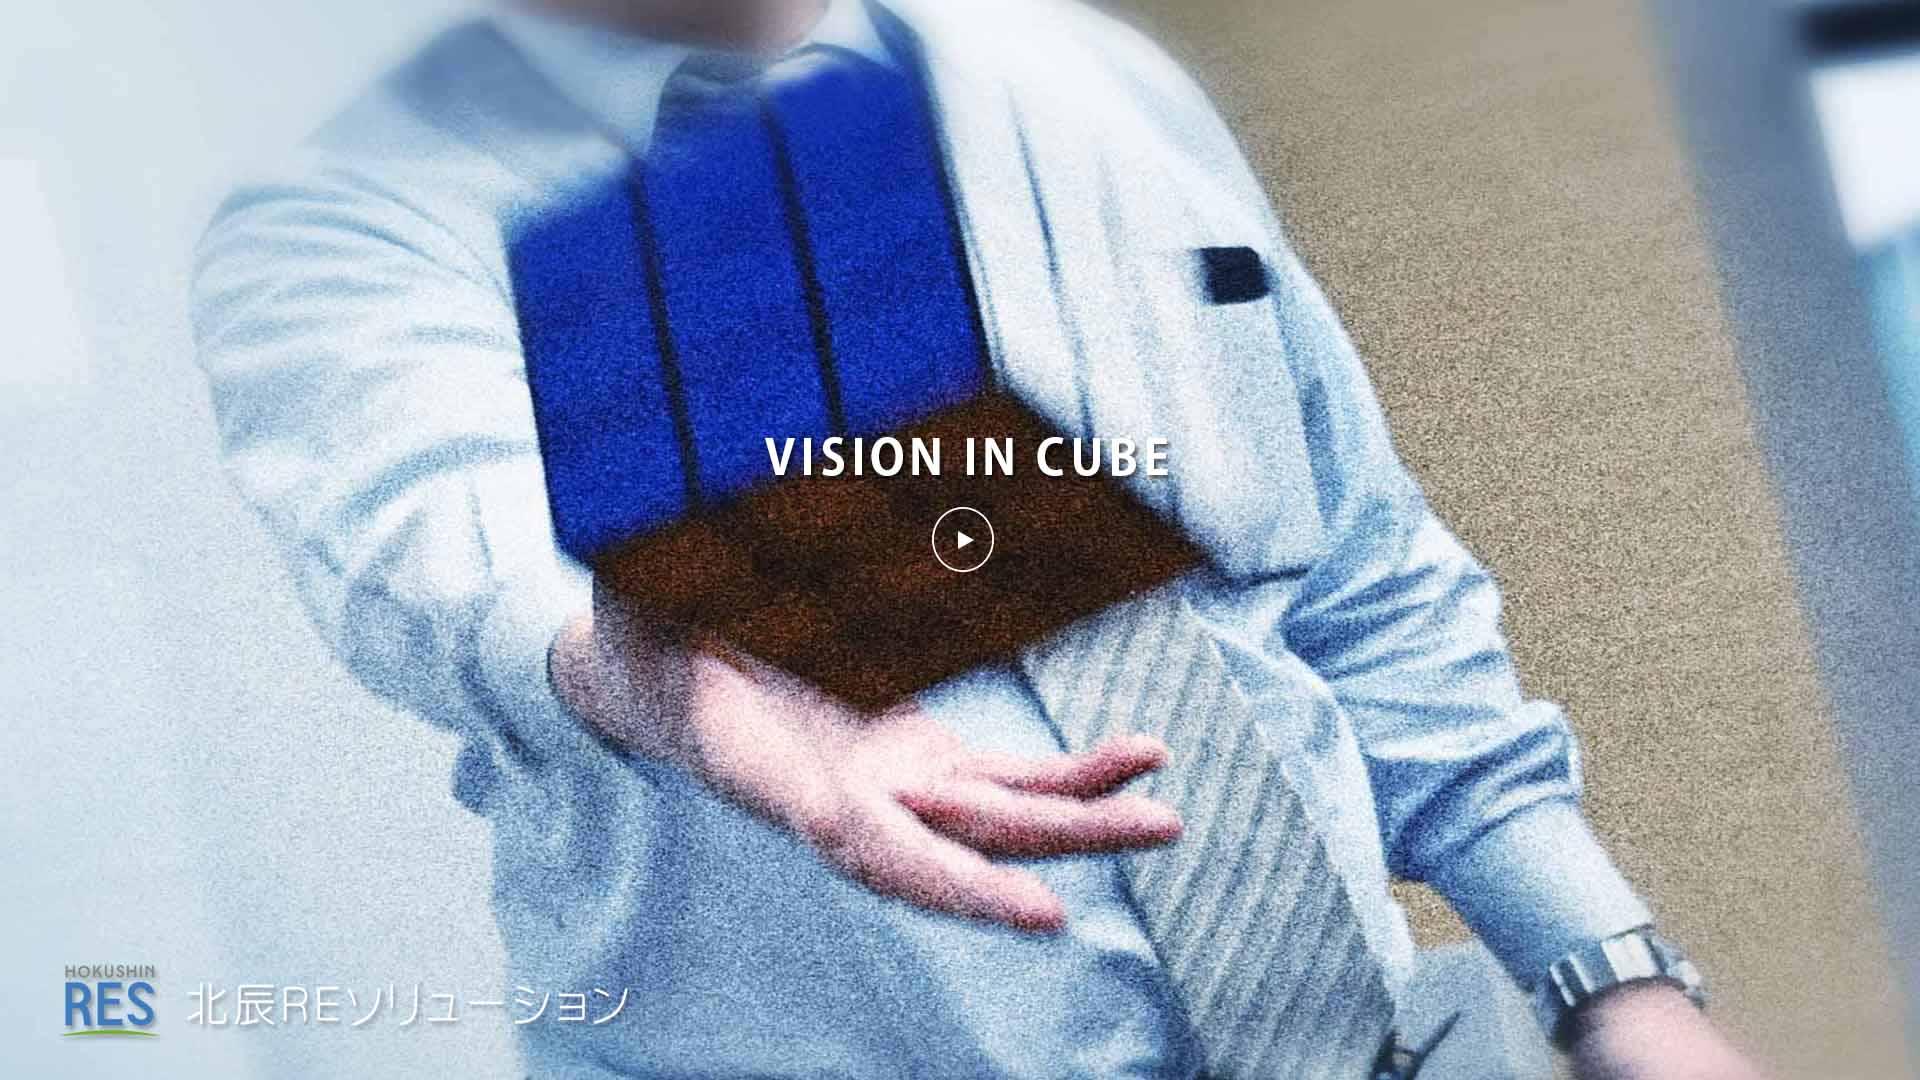 hres_vision